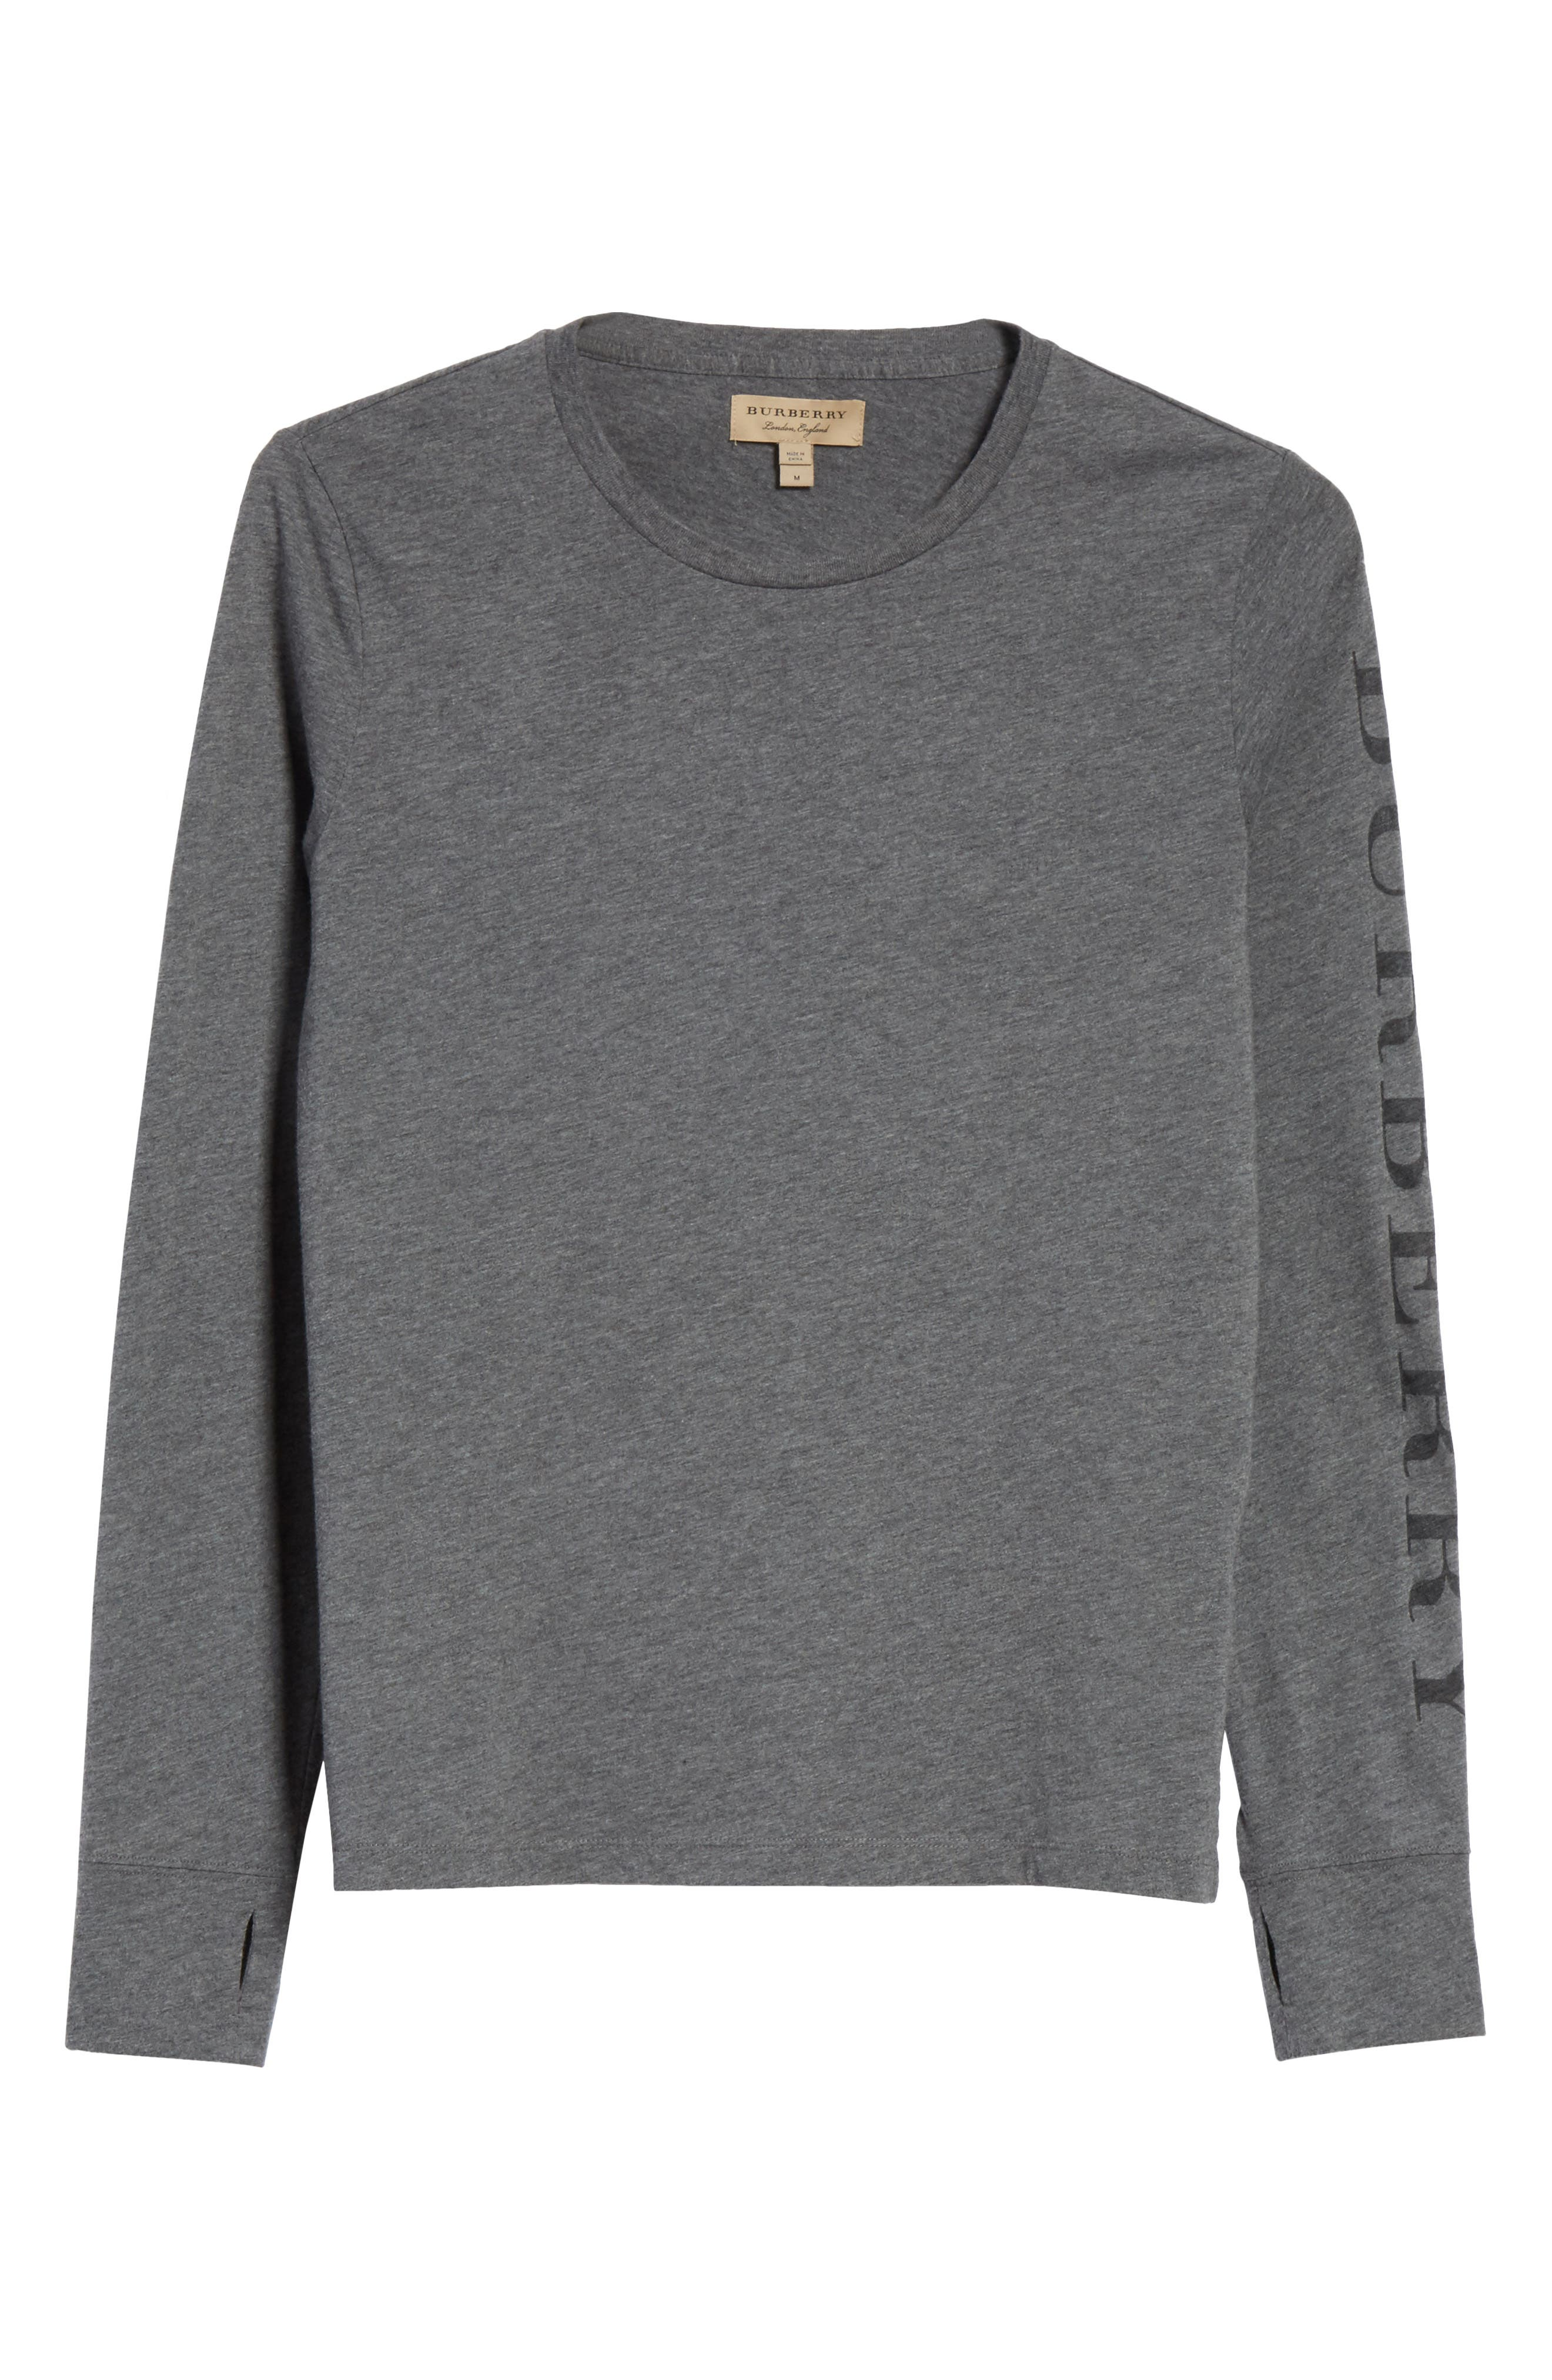 Marchston Regular Fit Crewneck Shirt,                             Main thumbnail 1, color,                             Mid Grey Melange